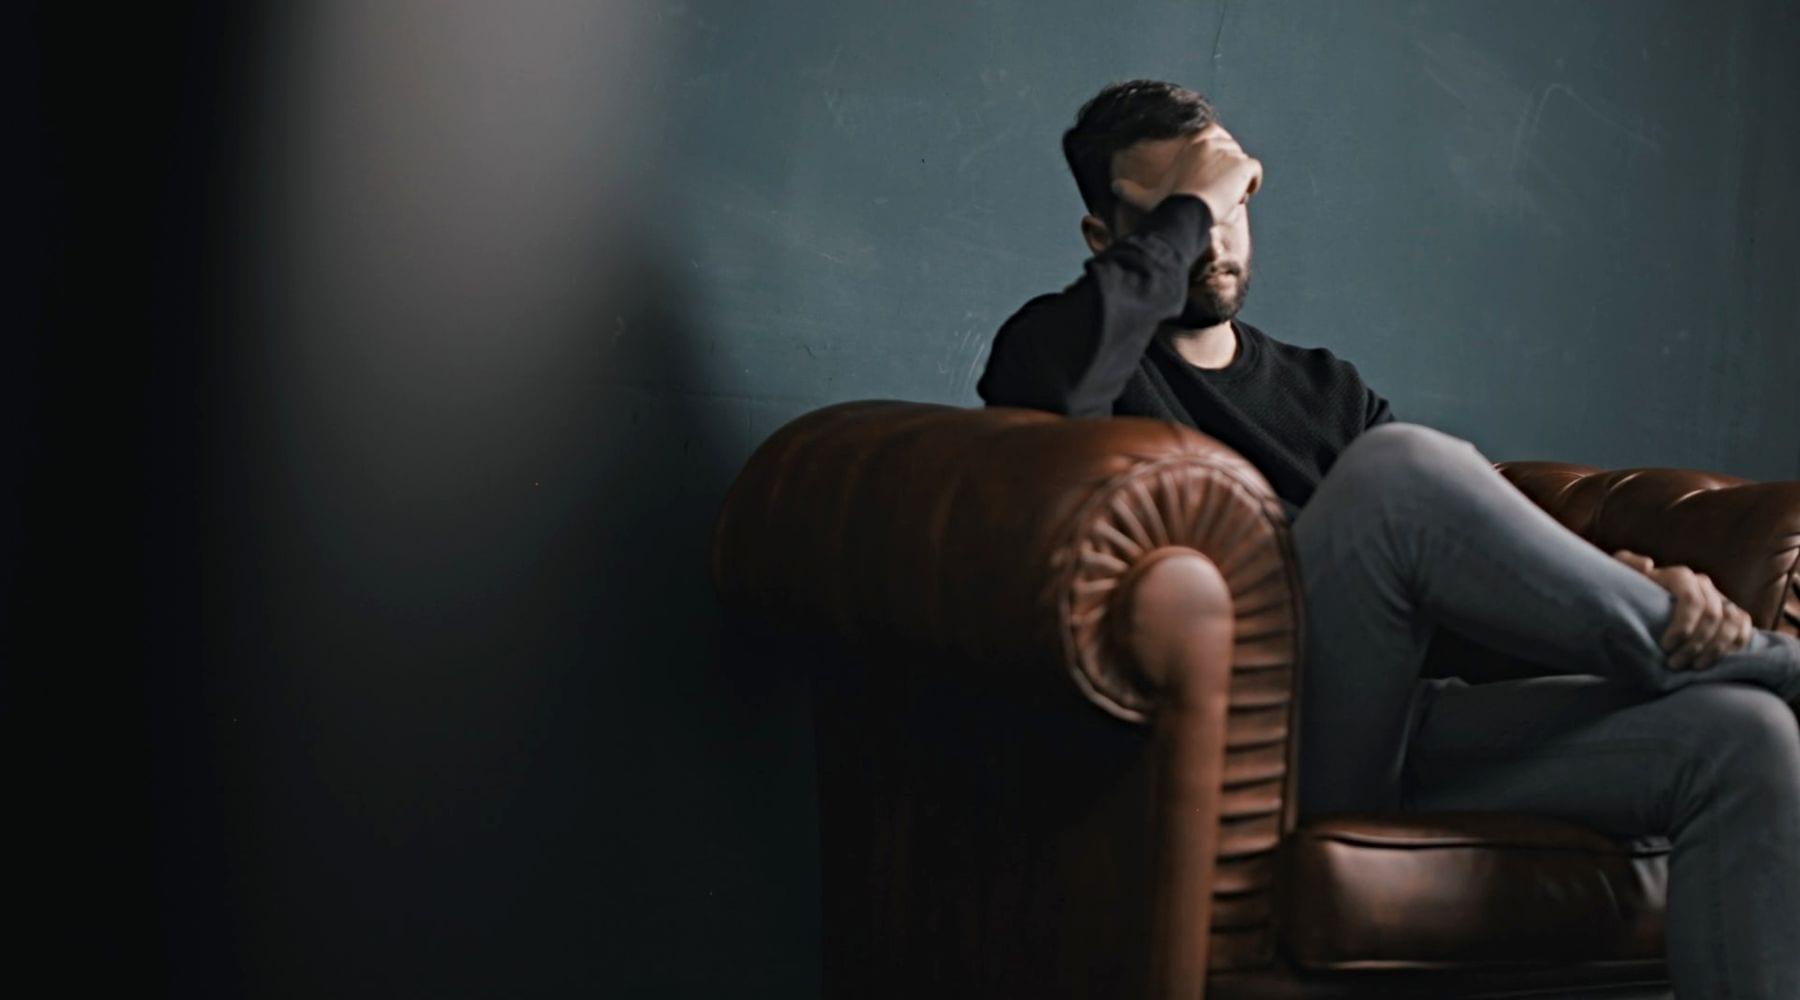 Sad man sitting alone on sofa